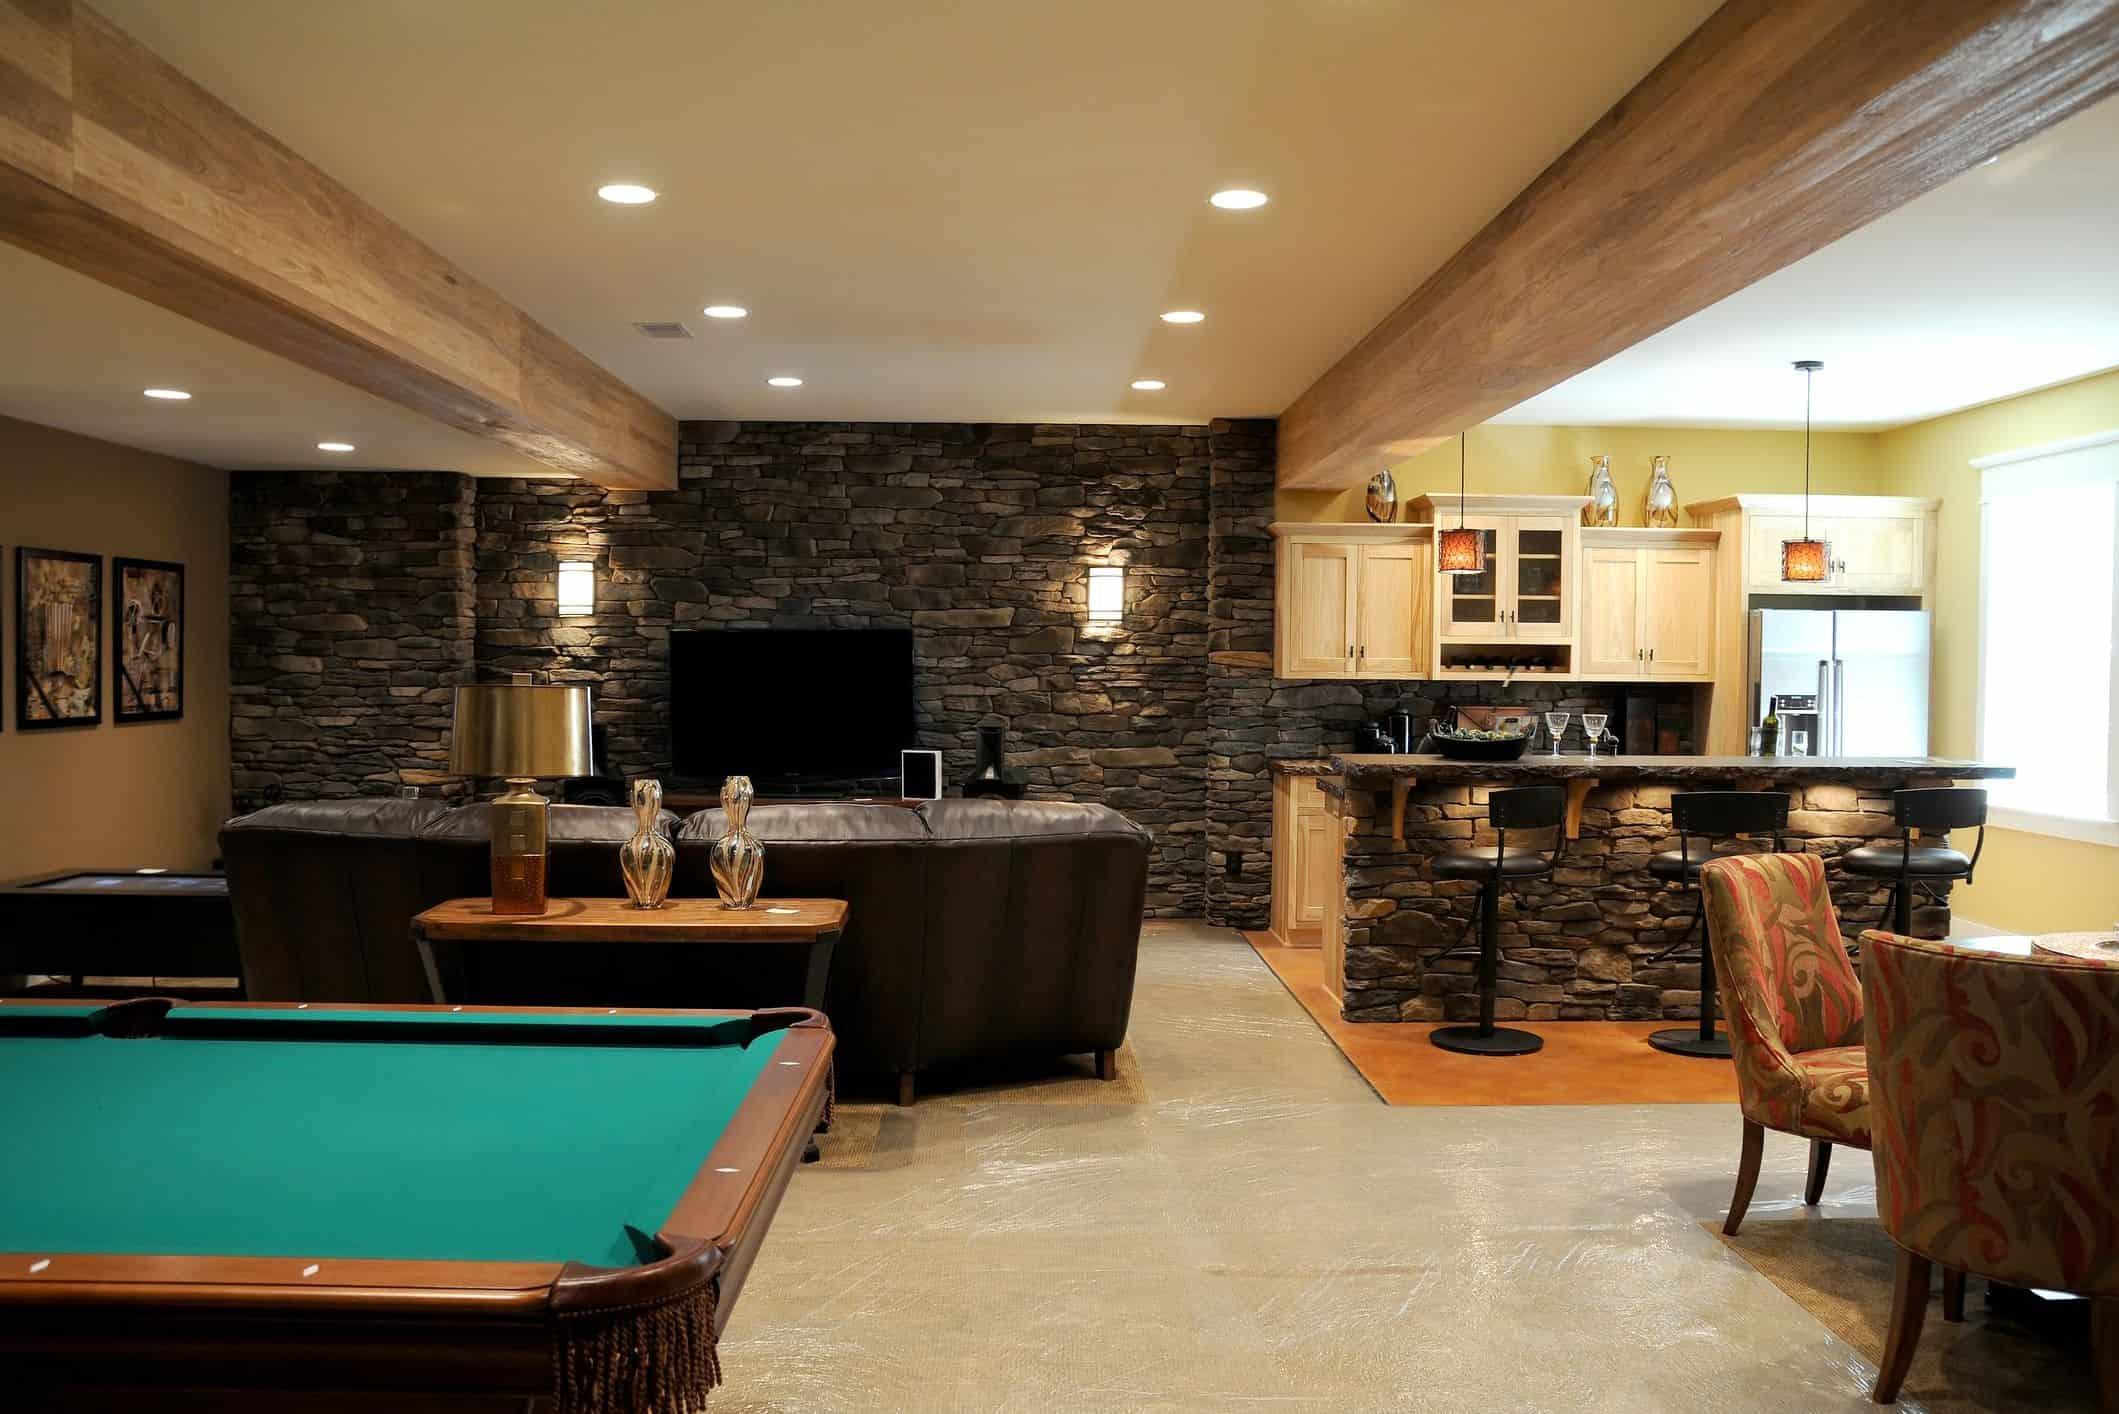 basement bar ideas on a budget Style Expansive